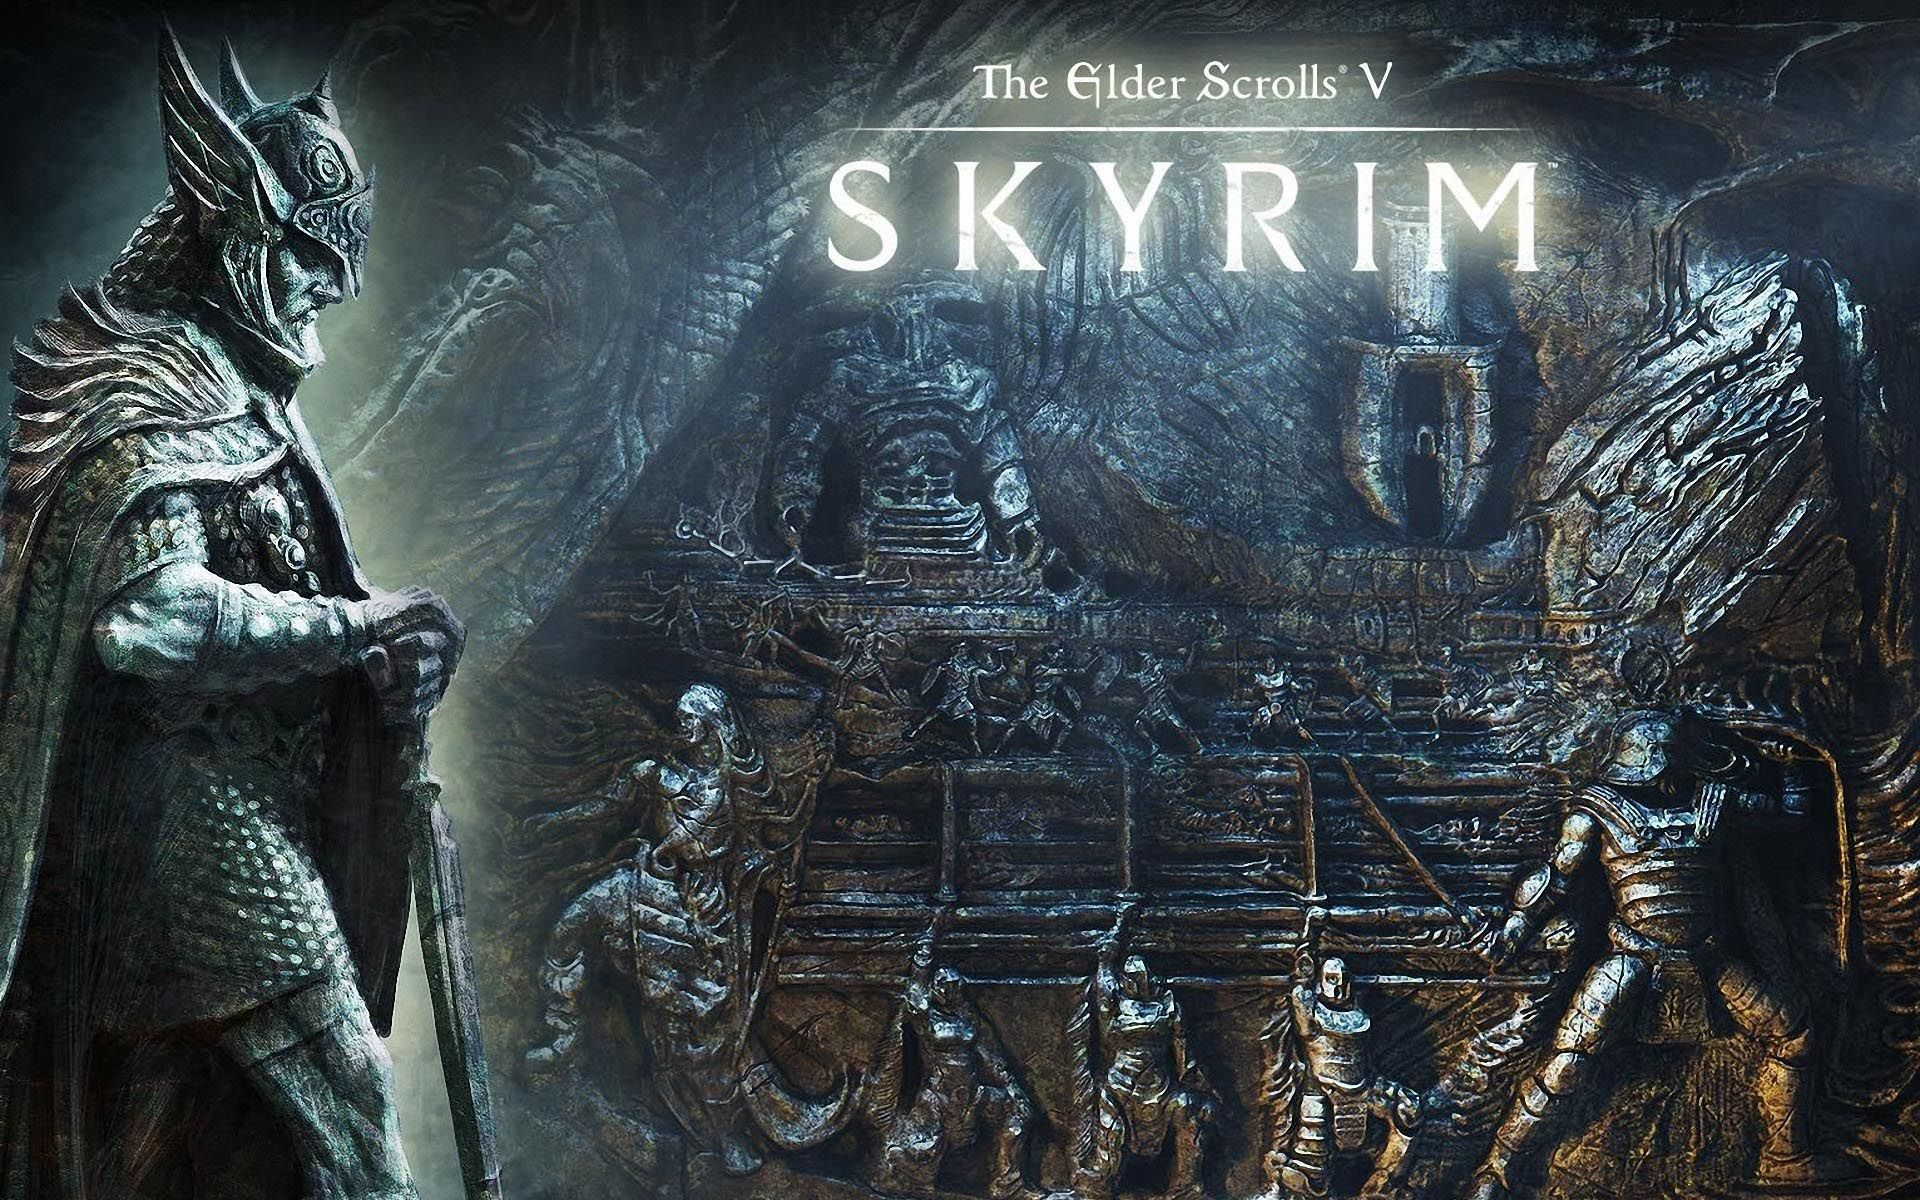 Norse Mythology Wallpaper Skyrim Wallpaper Skyrim Elder Scrolls V Skyrim